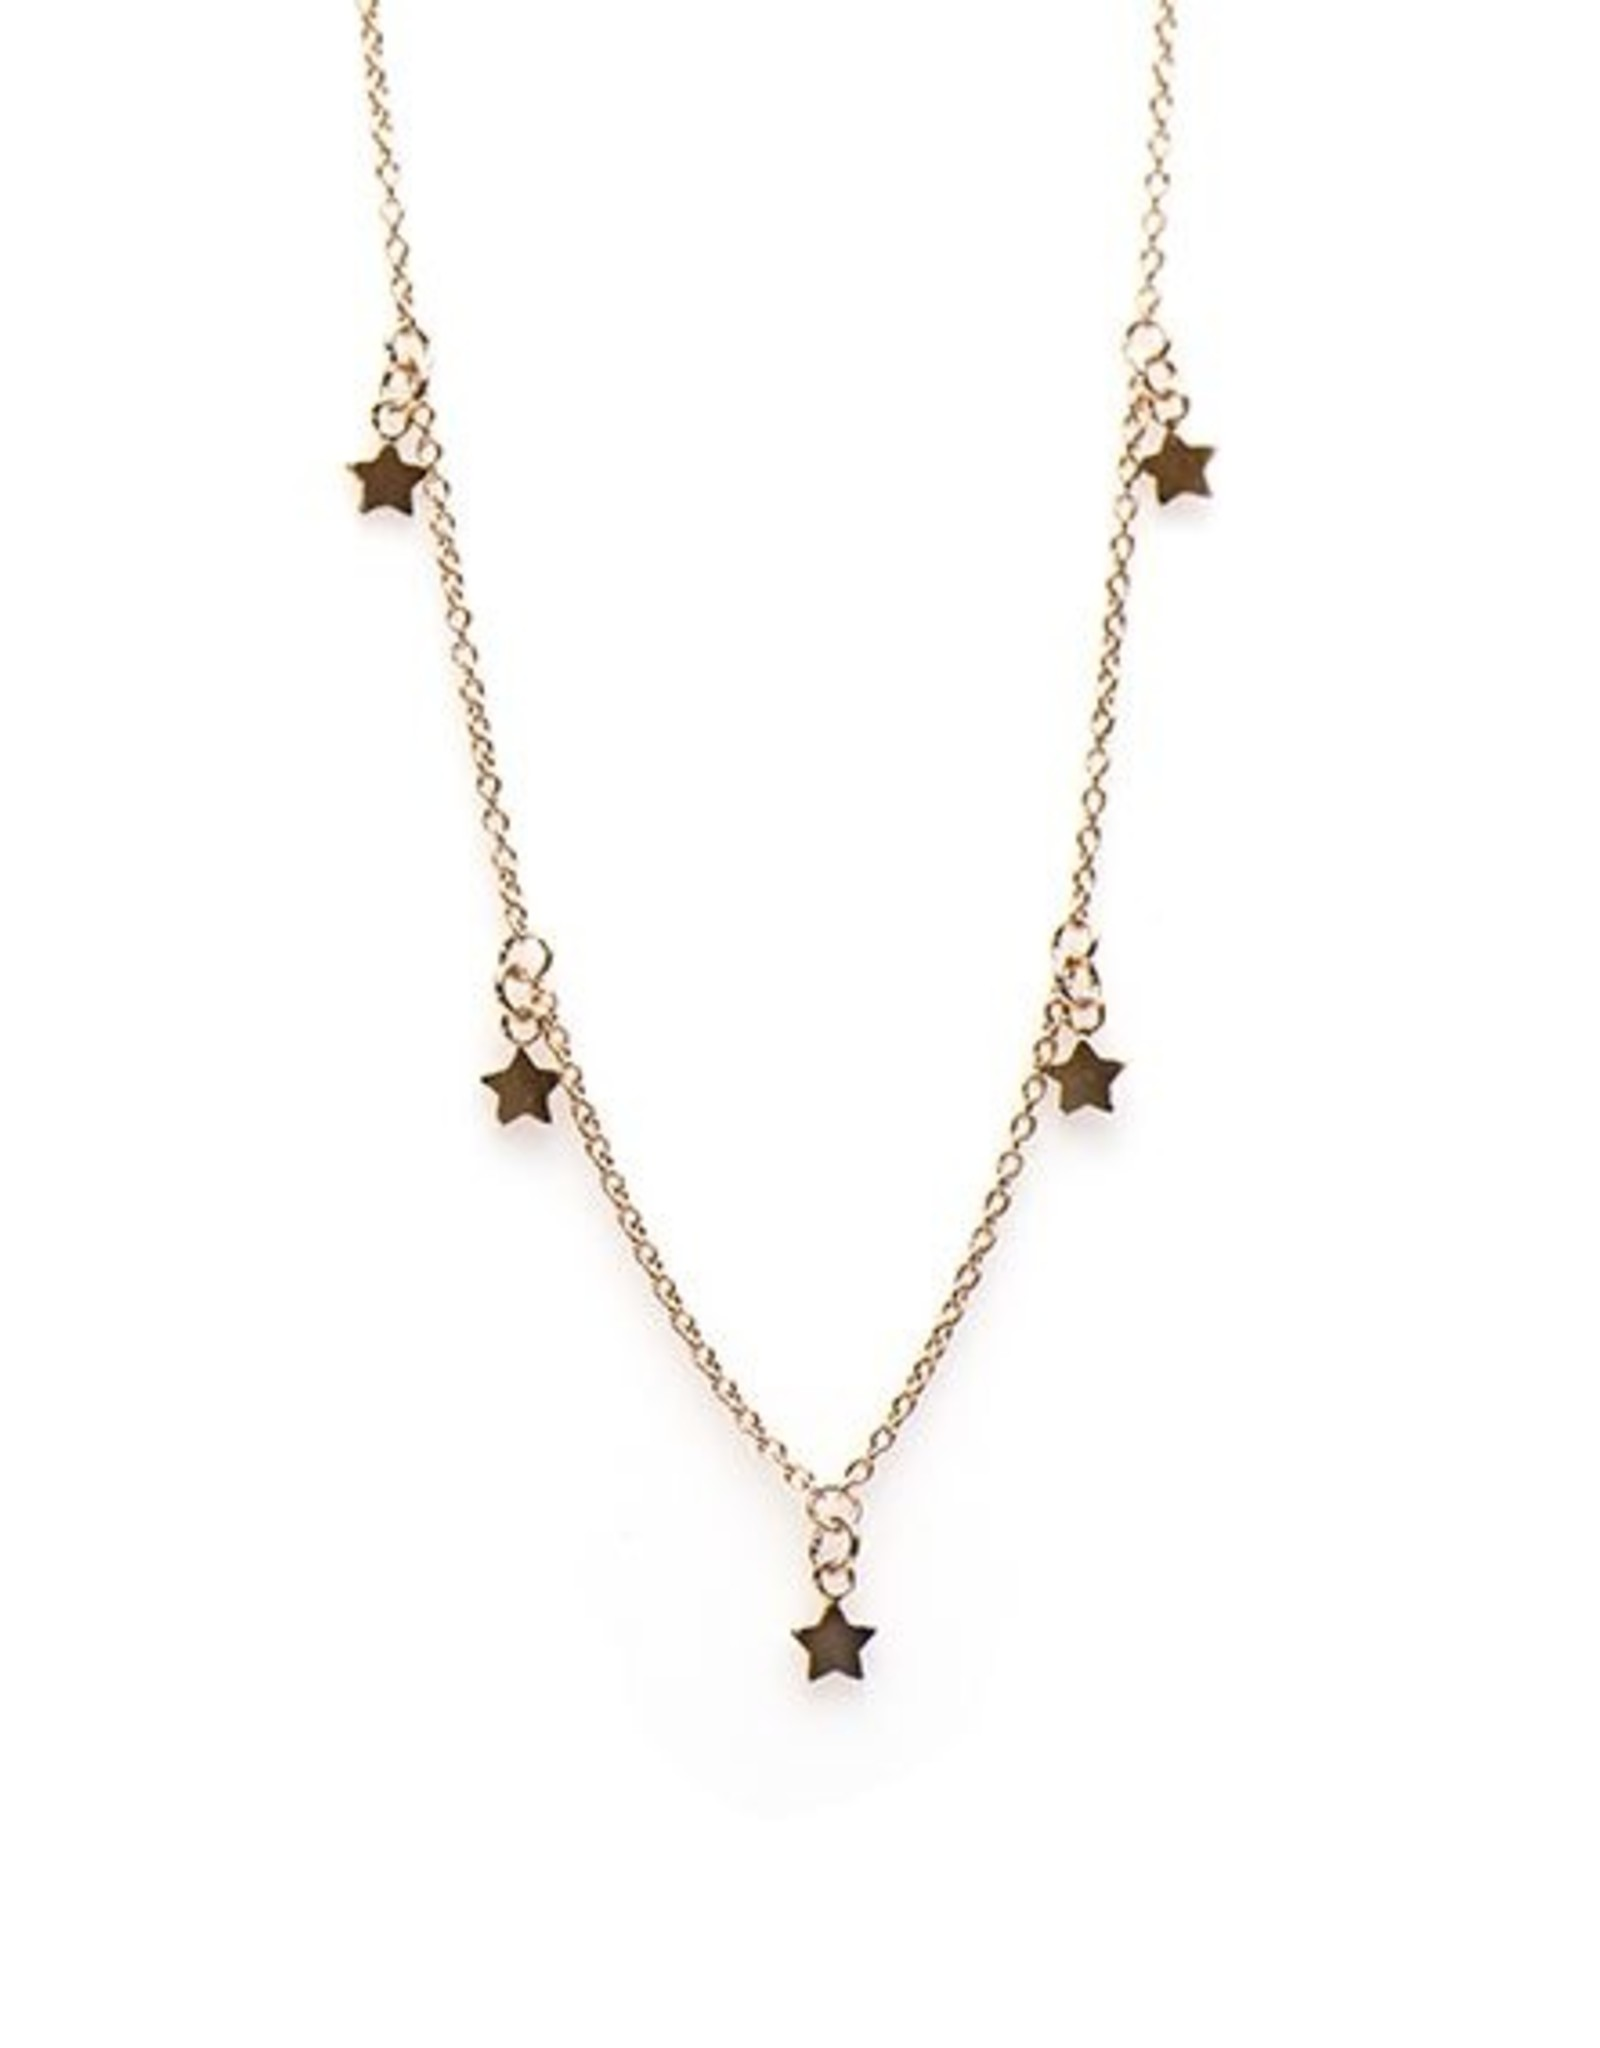 Karma Necklace 5 Stars Roseplated